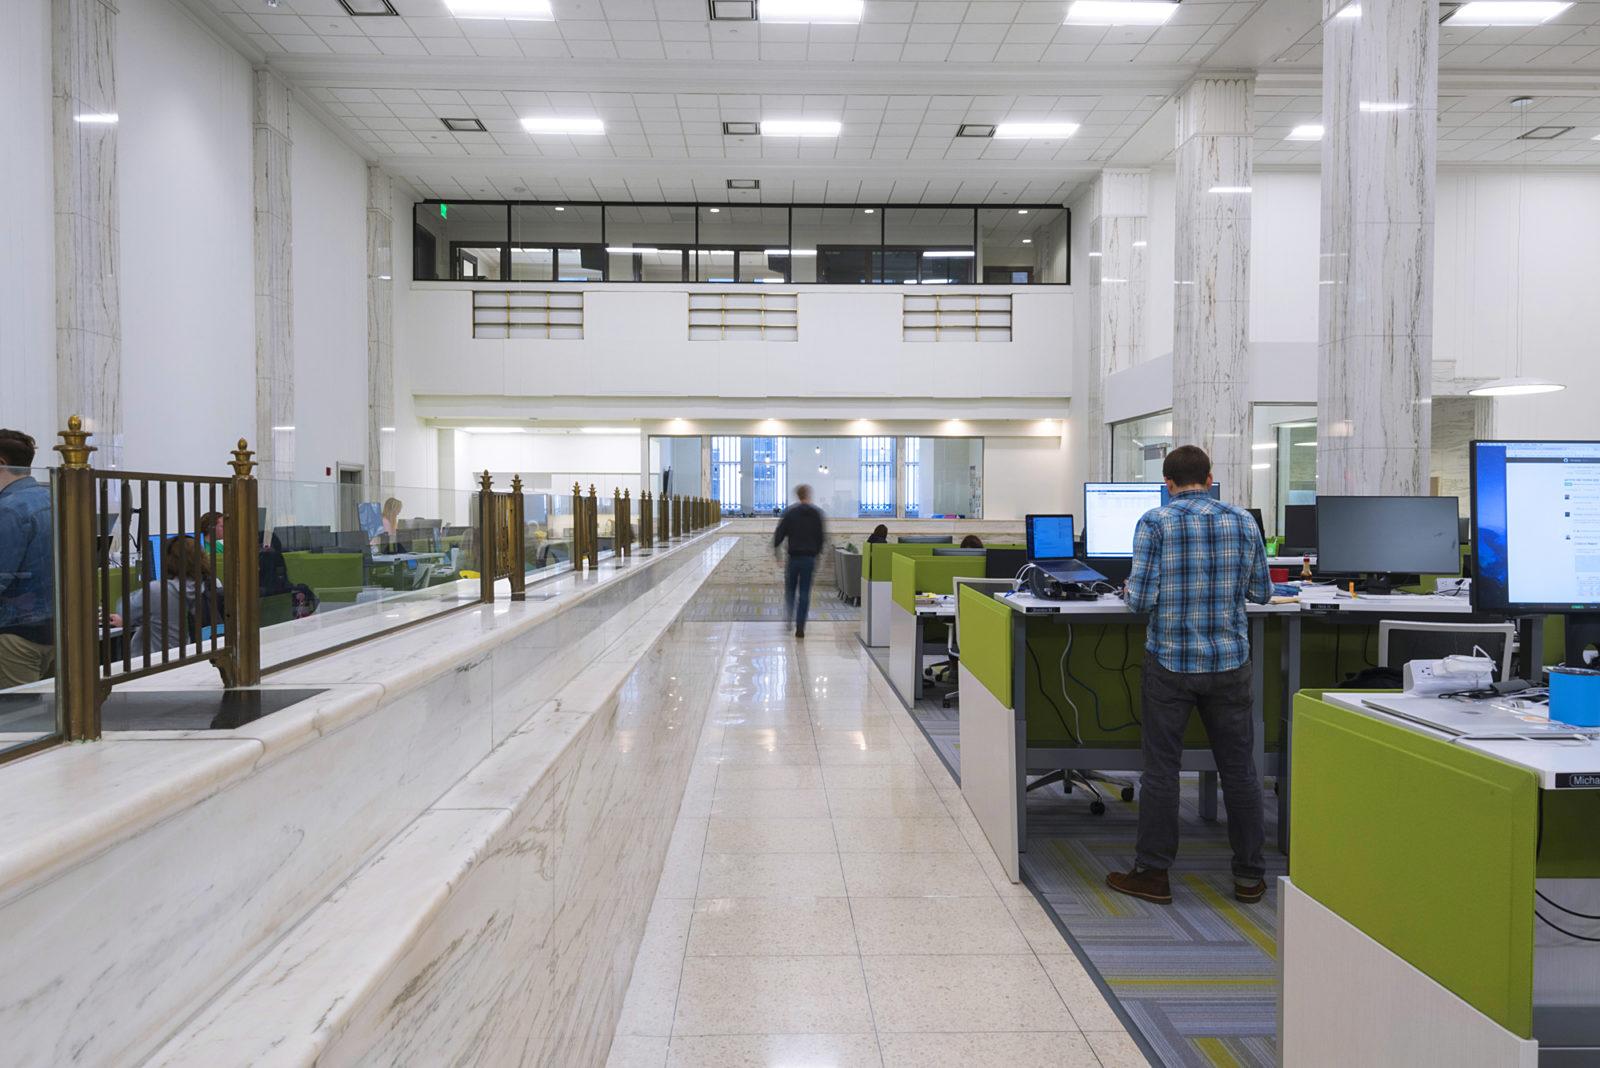 open office space in Shipt headquarters